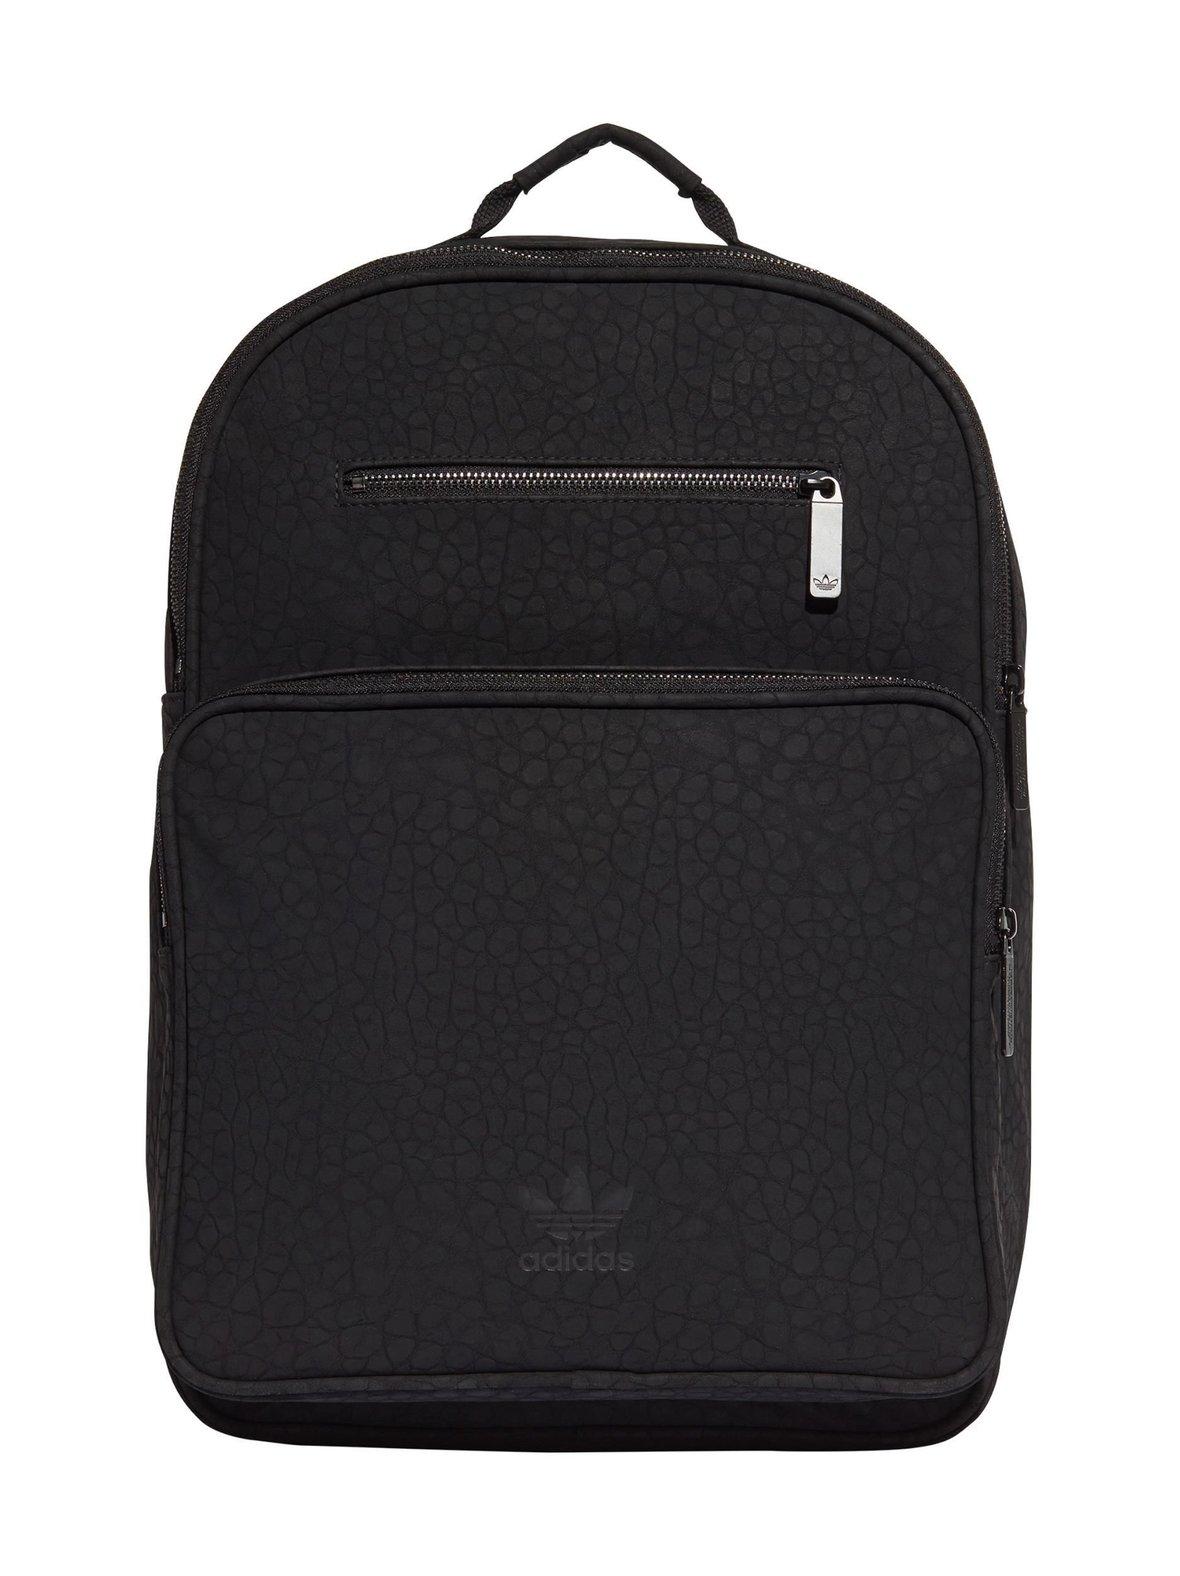 624b92b558 Black (musta) Adidas Originals AC F Backpack -reppu CE5628